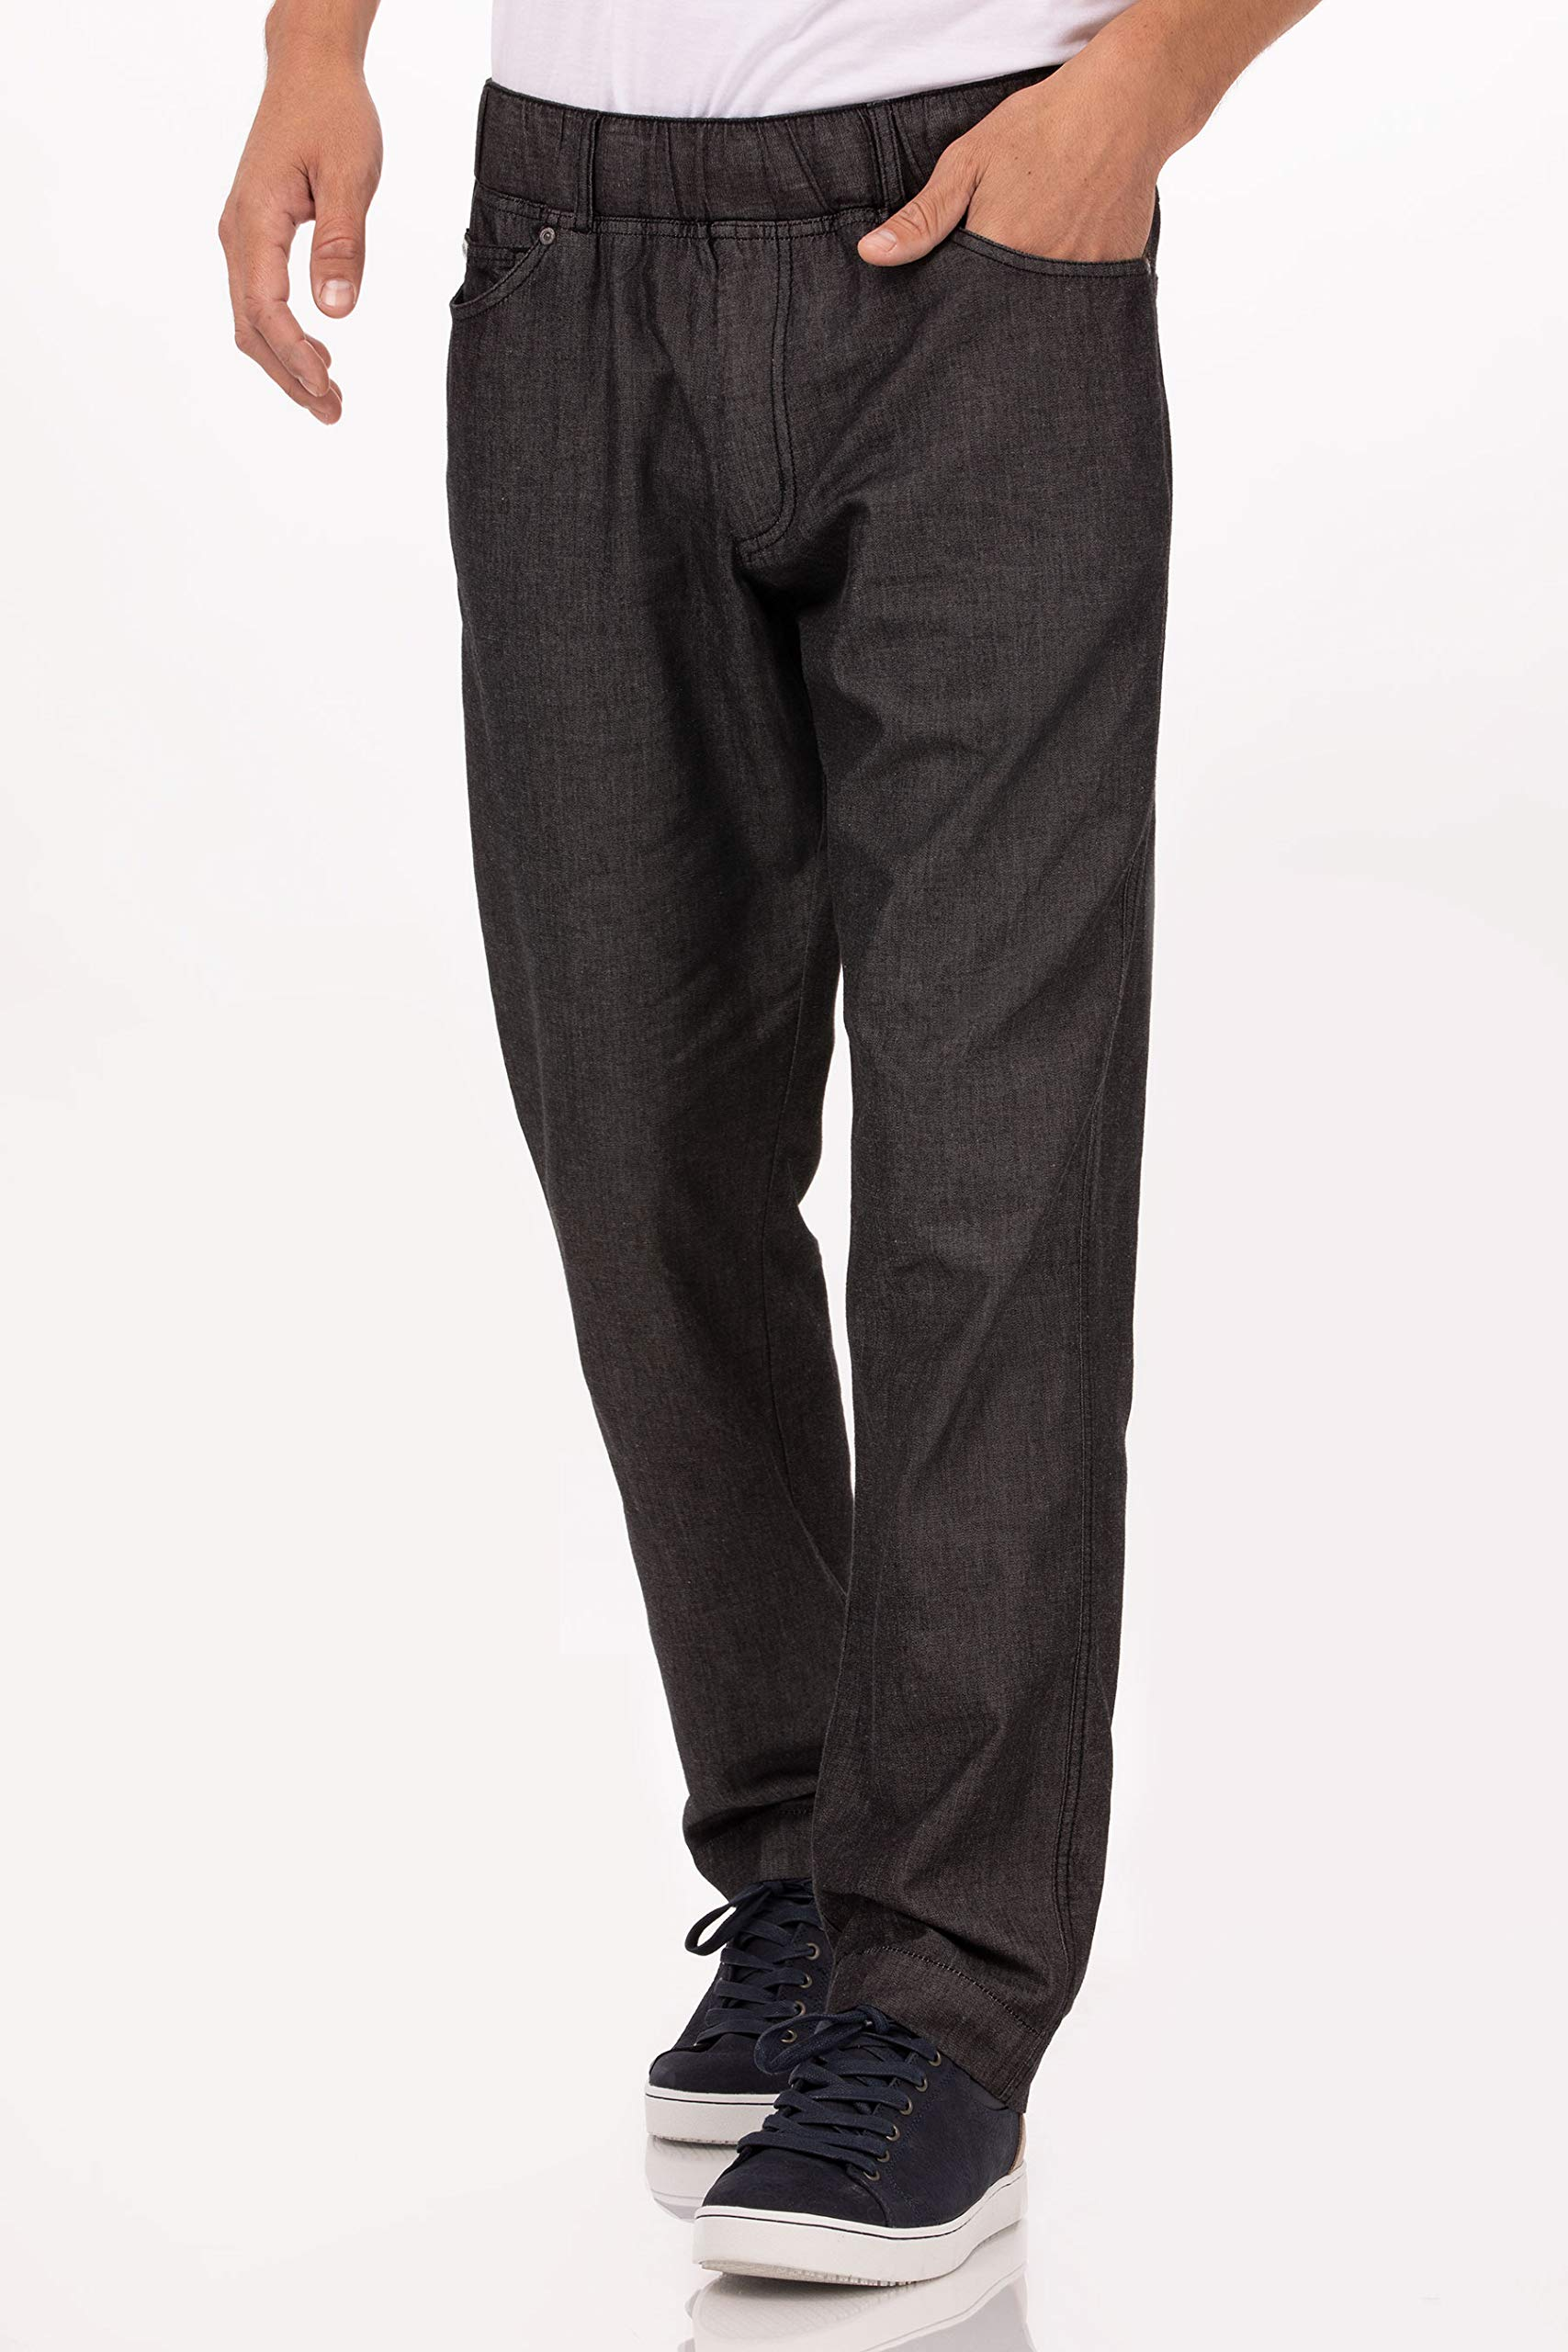 Chef Works Men's Gramercy Chef Pants, Black, Medium by Chef Works